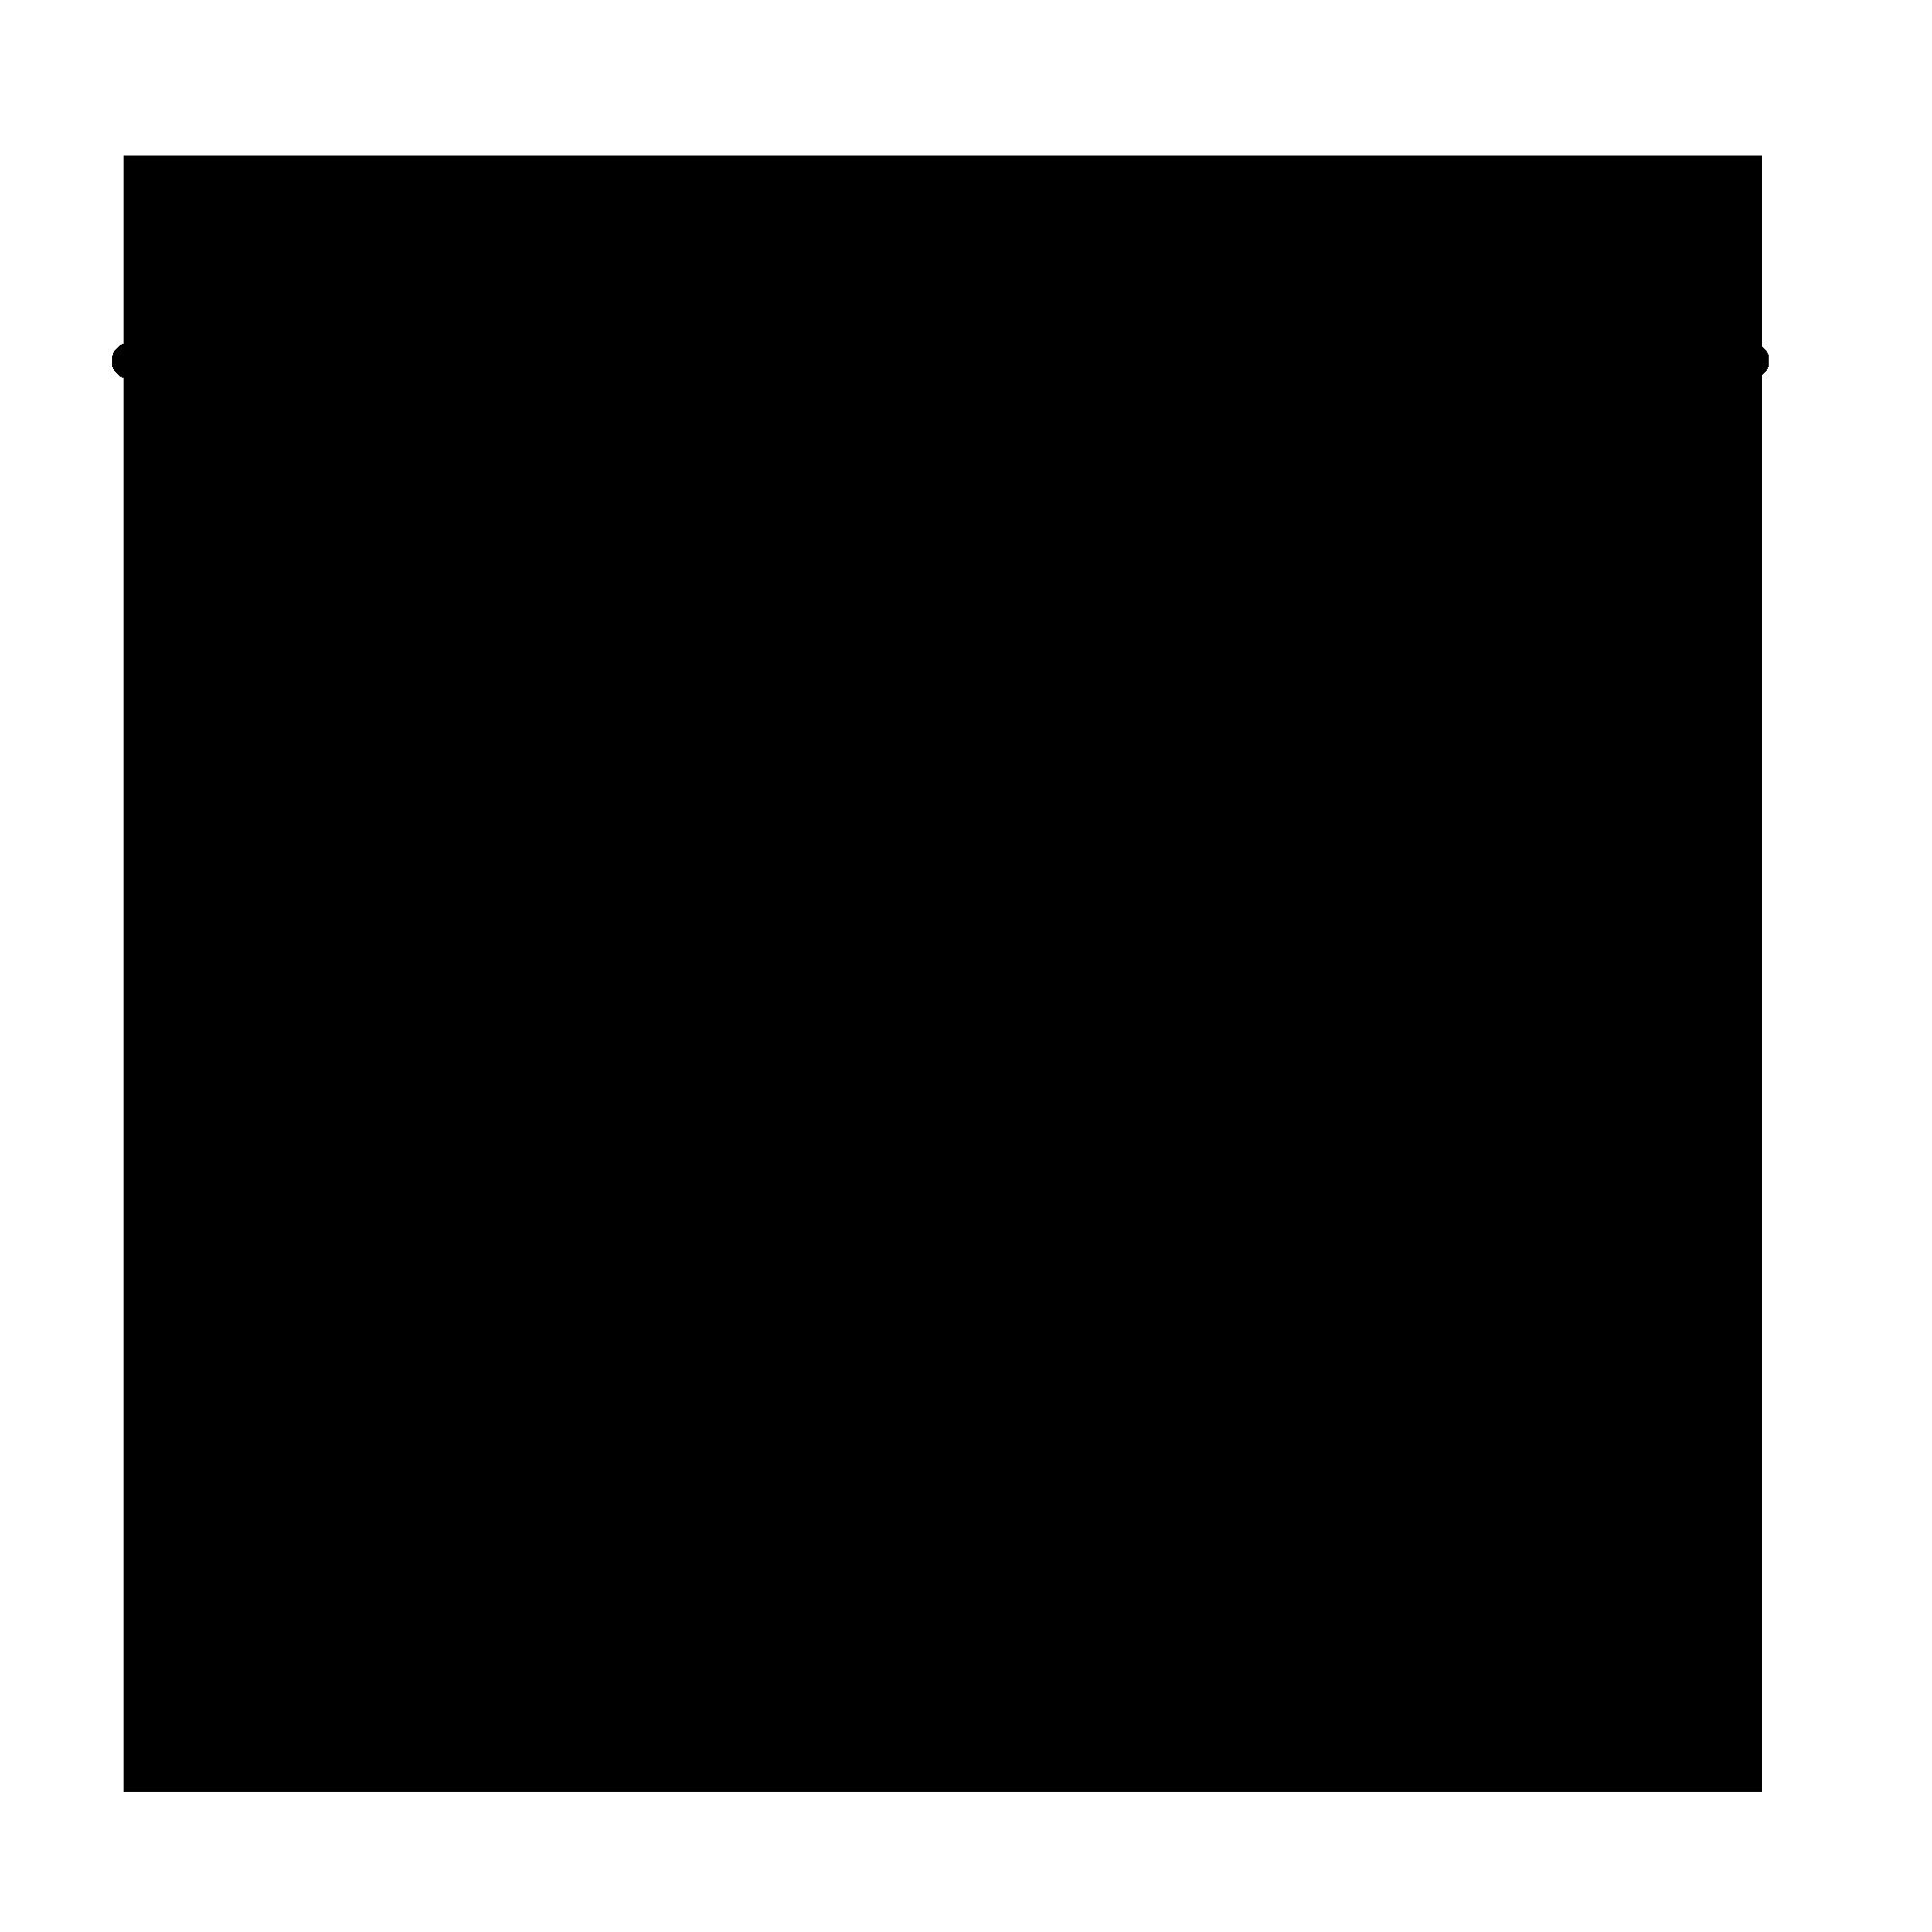 5Knivar-5Knivar